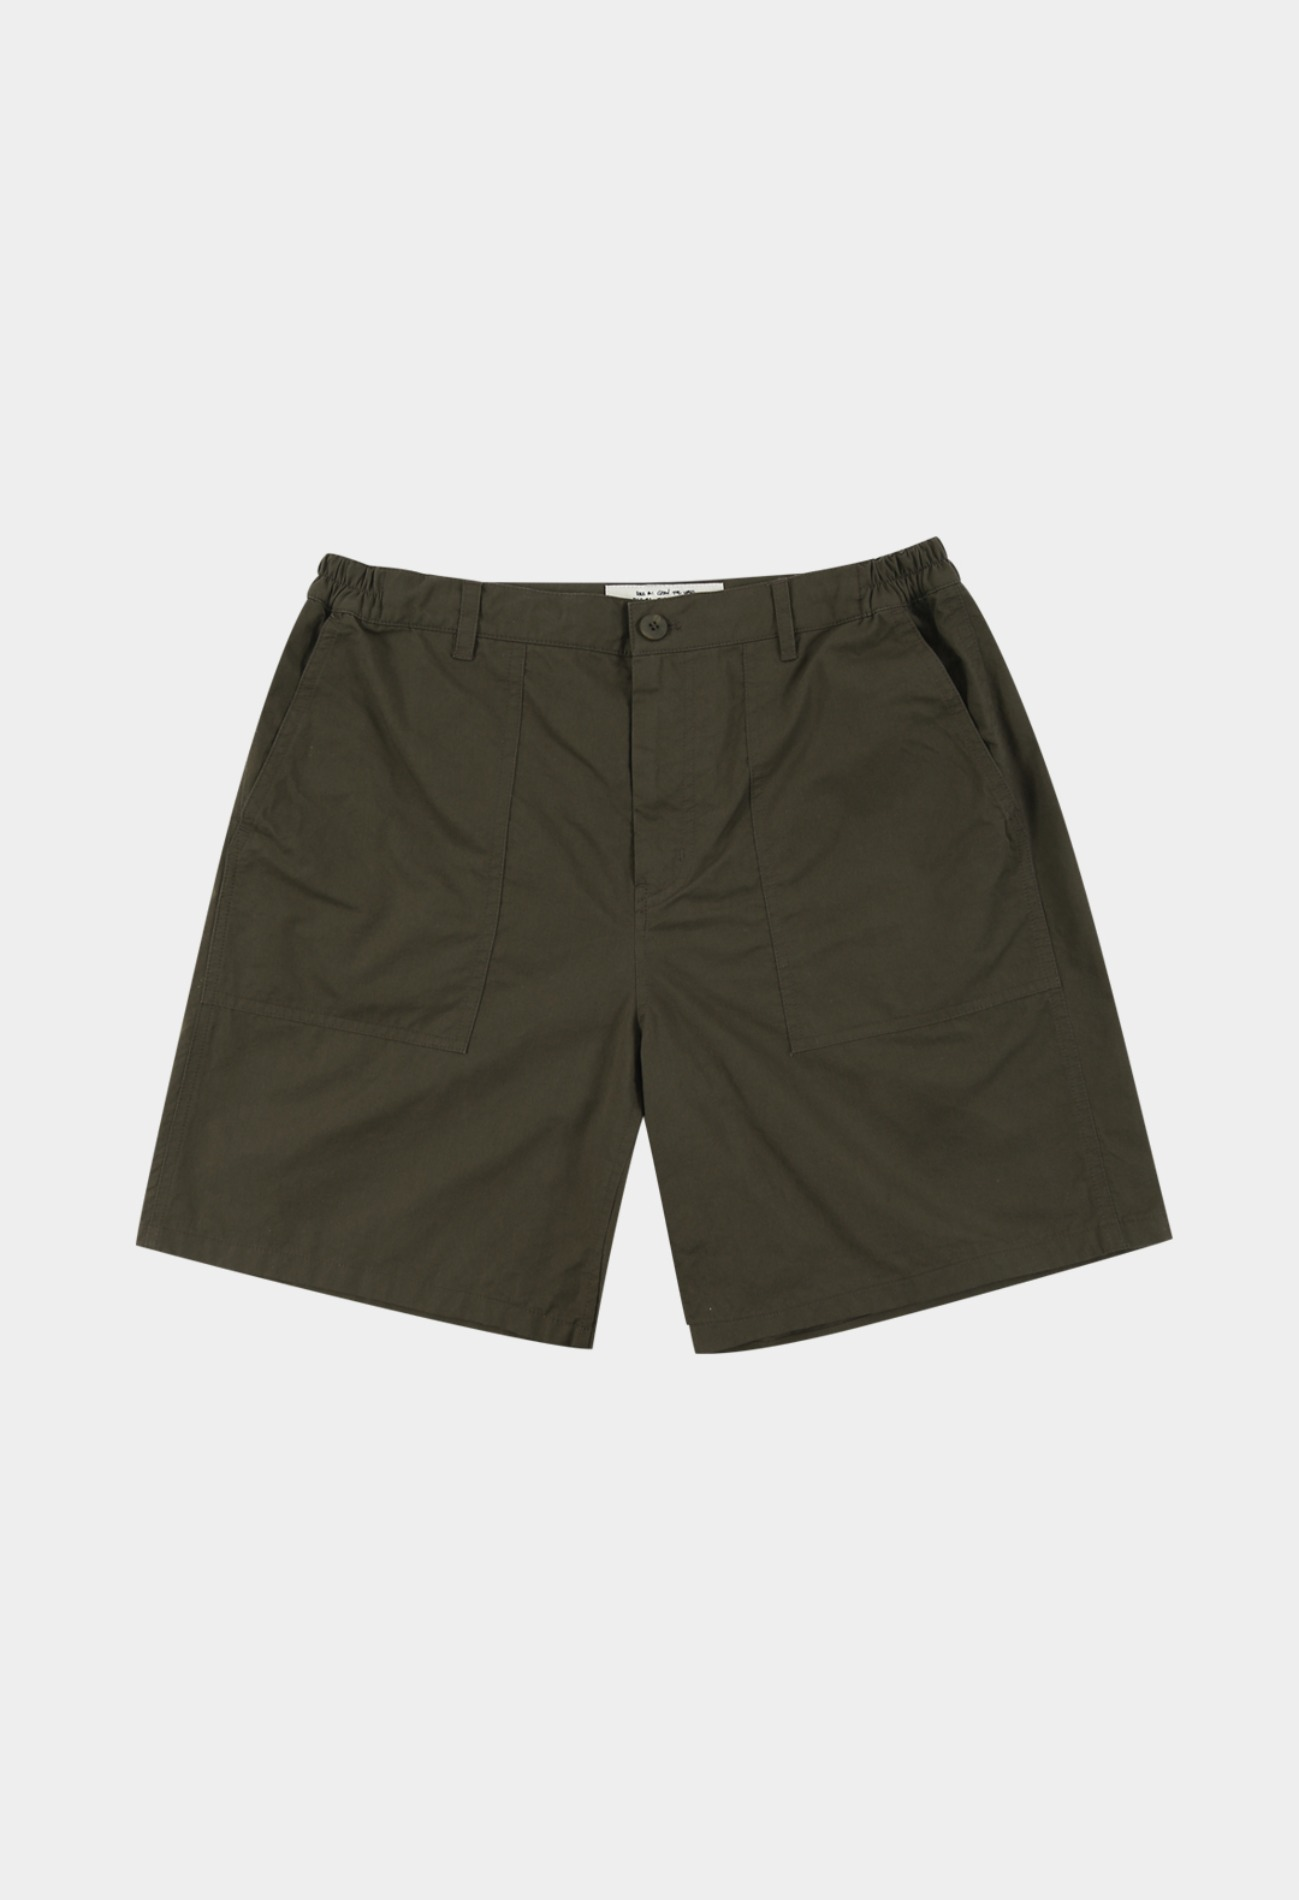 keek Fatigue Short Pants - Khaki 스트릿패션 유니섹스브랜드 커플시밀러룩 남자쇼핑몰 여성의류쇼핑몰 후드티 힙색